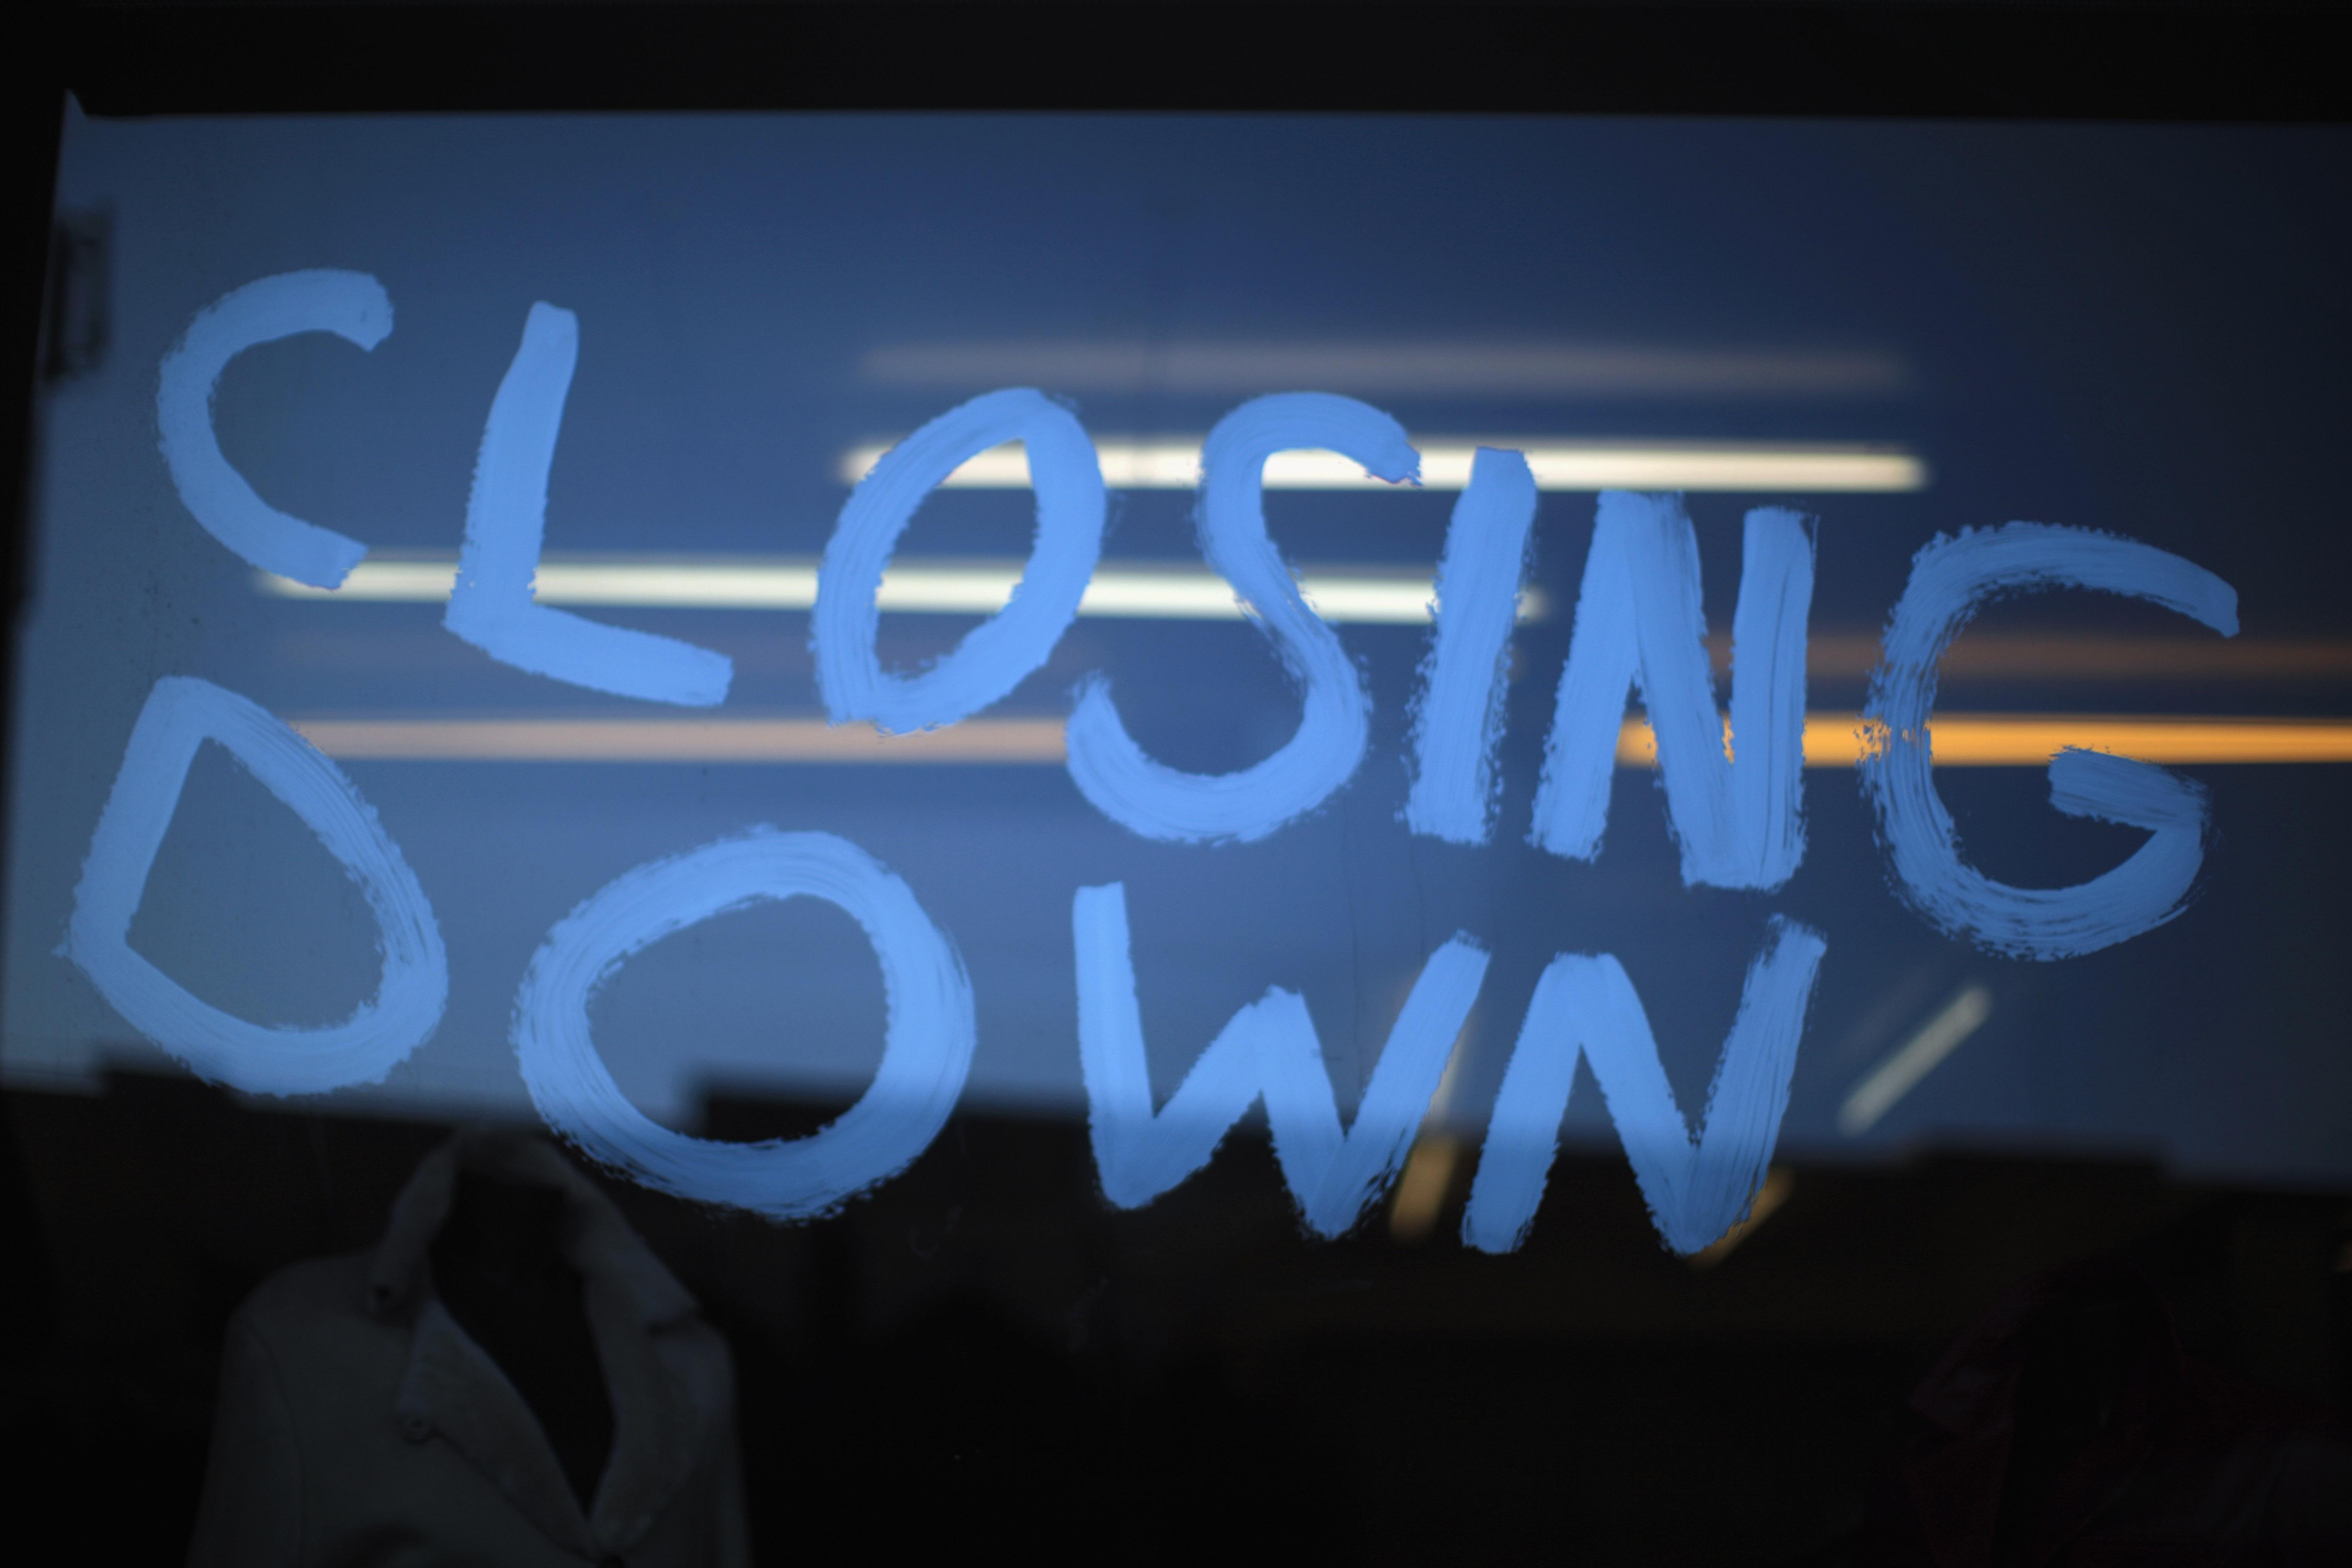 Closing-down-sign.jpg